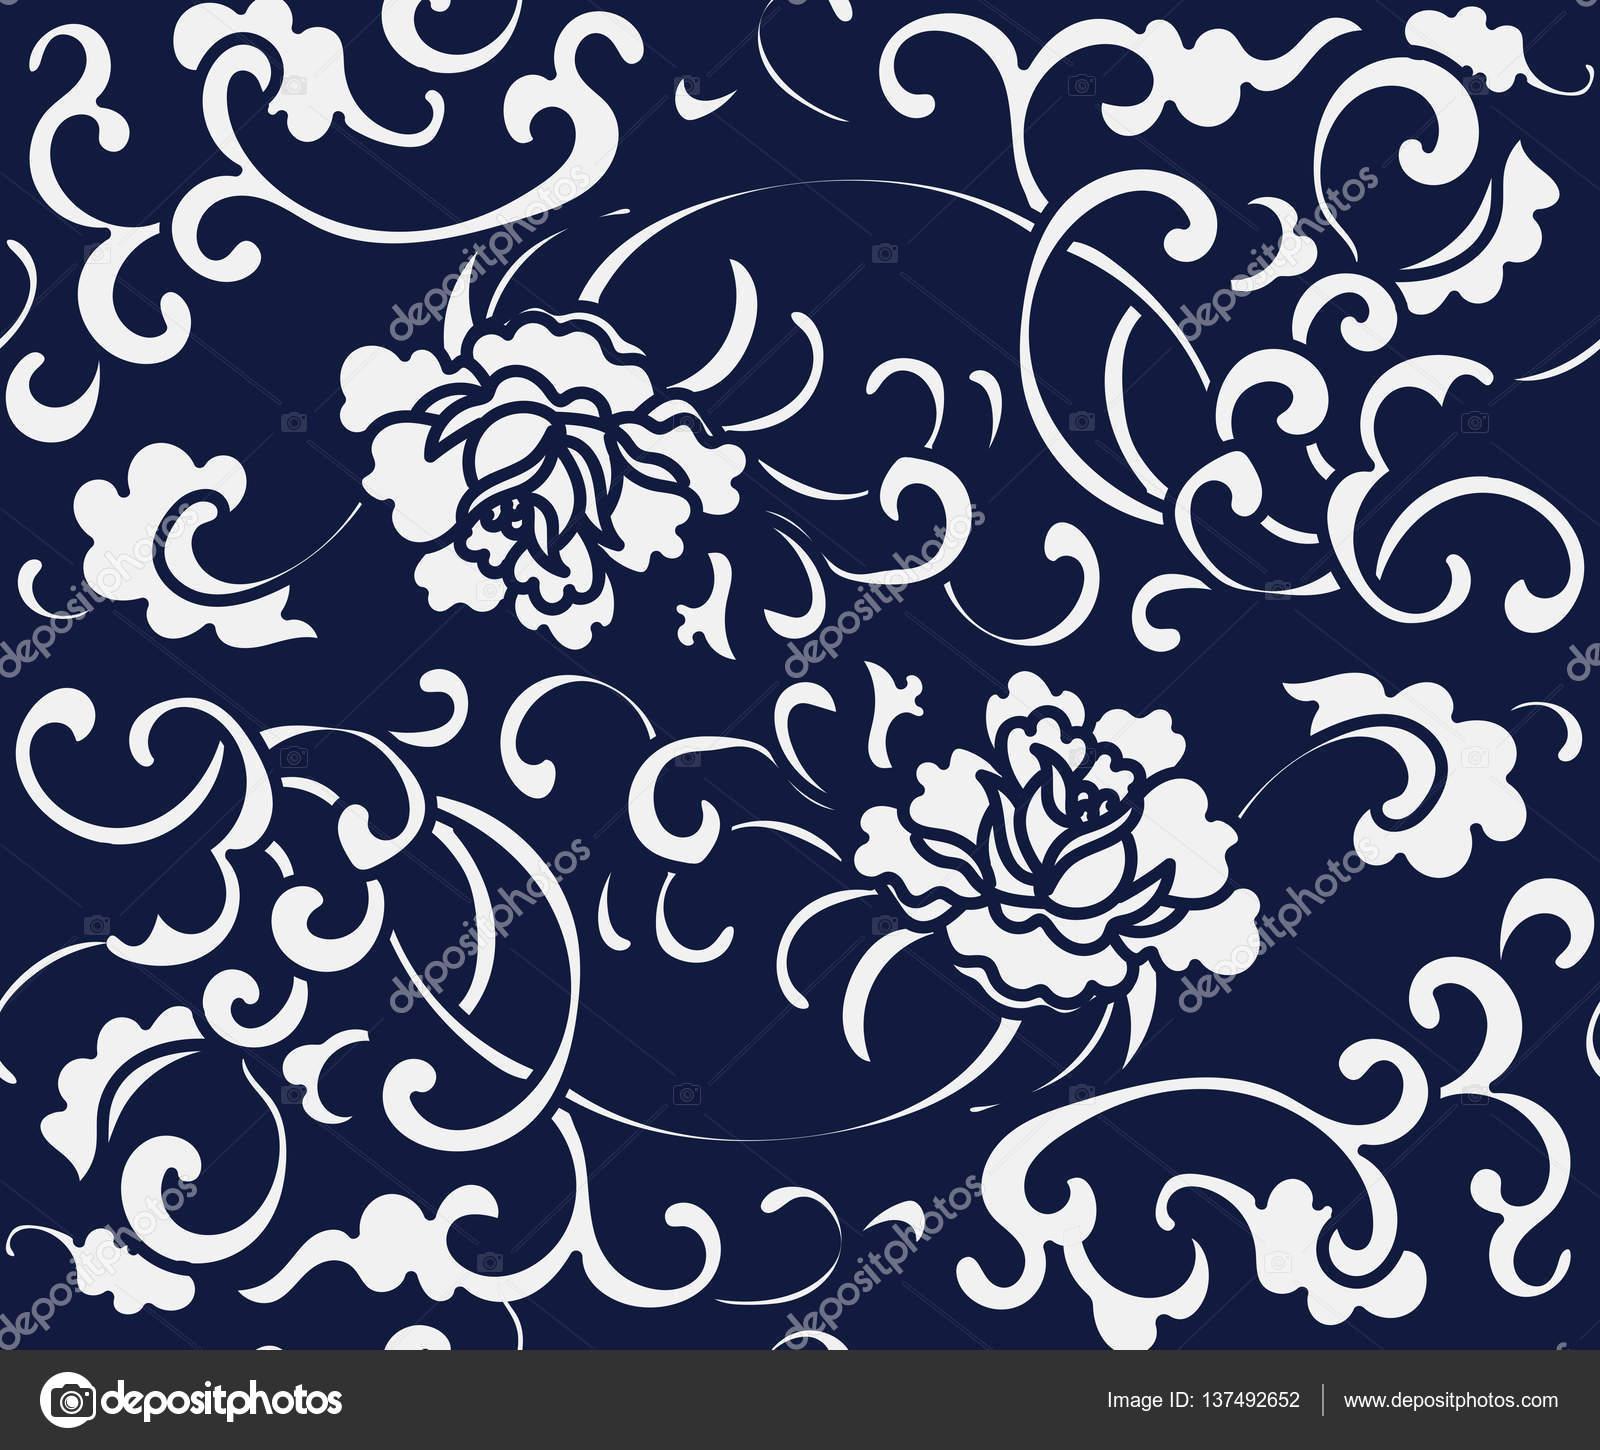 giunte senza giapponese giardino Fiore spirale di di blu a vite PqXwxUB